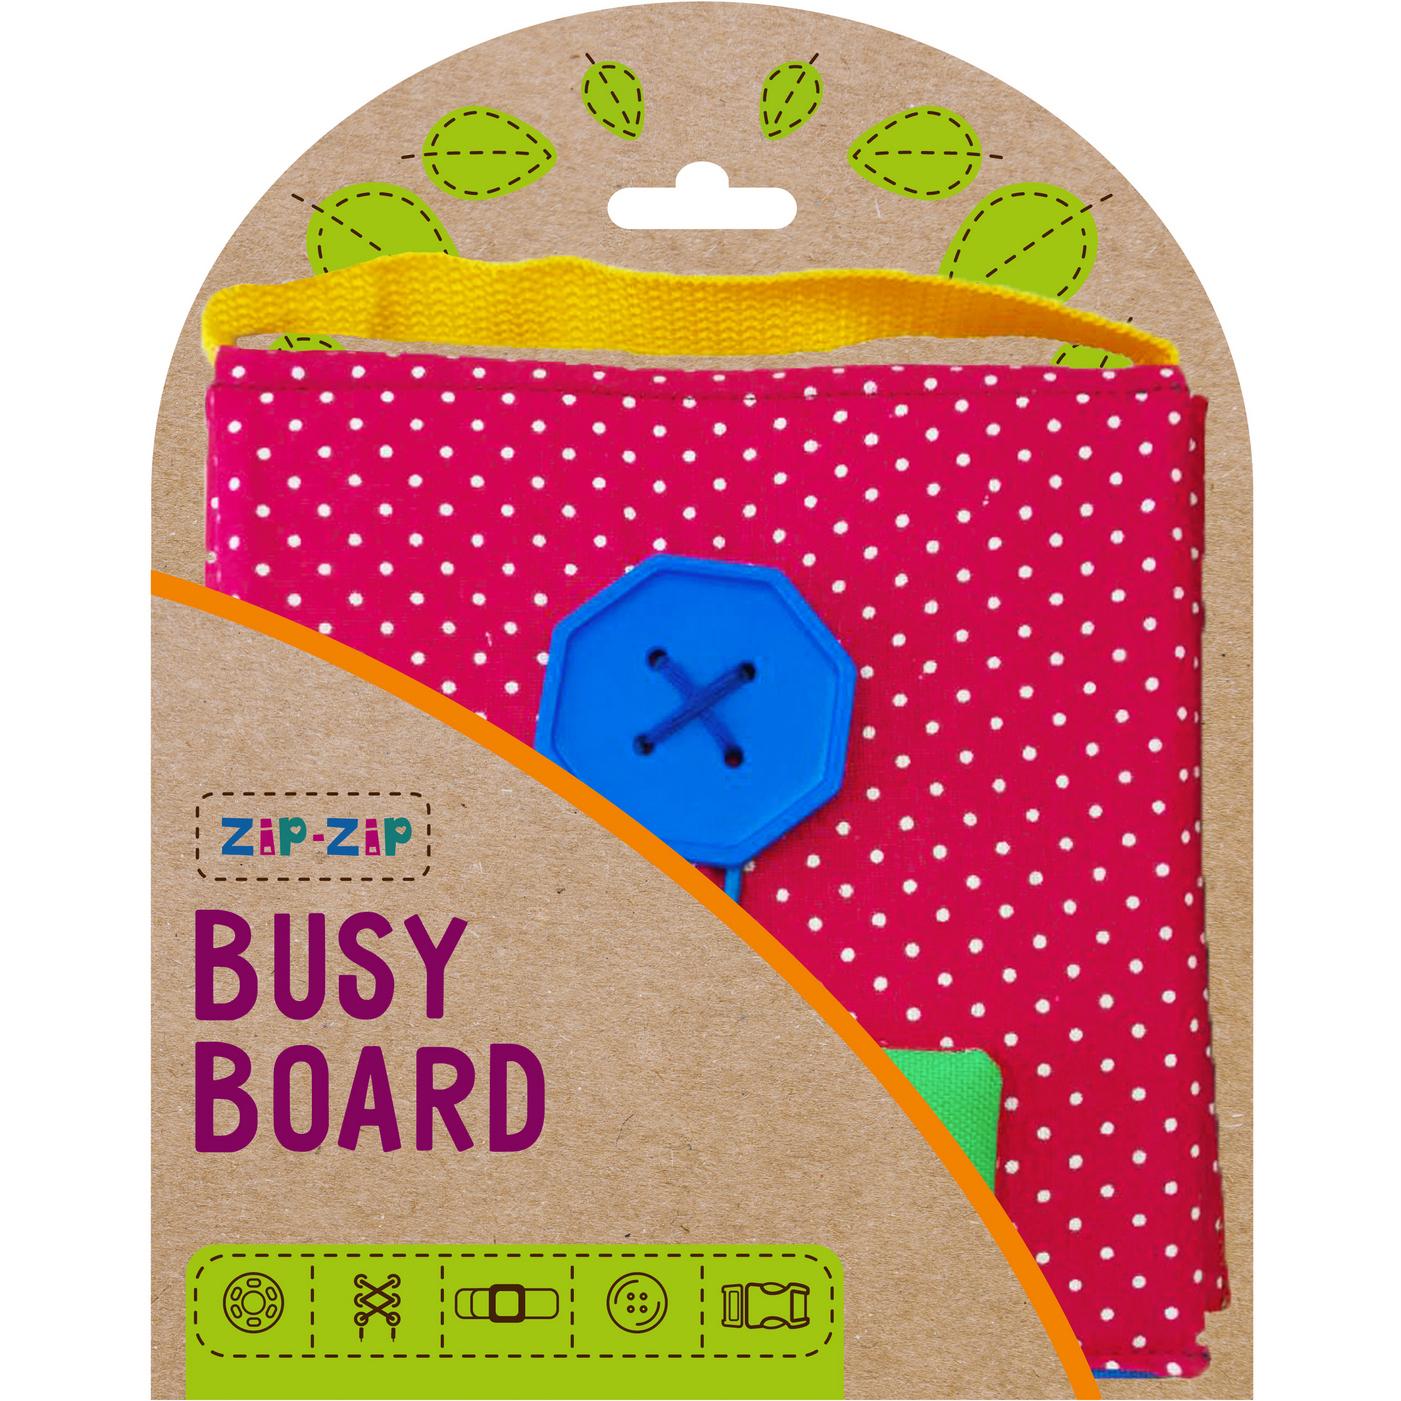 Joc de indemanare Carte Senzoriala Busy Board Roter Kafer RZ2001-02